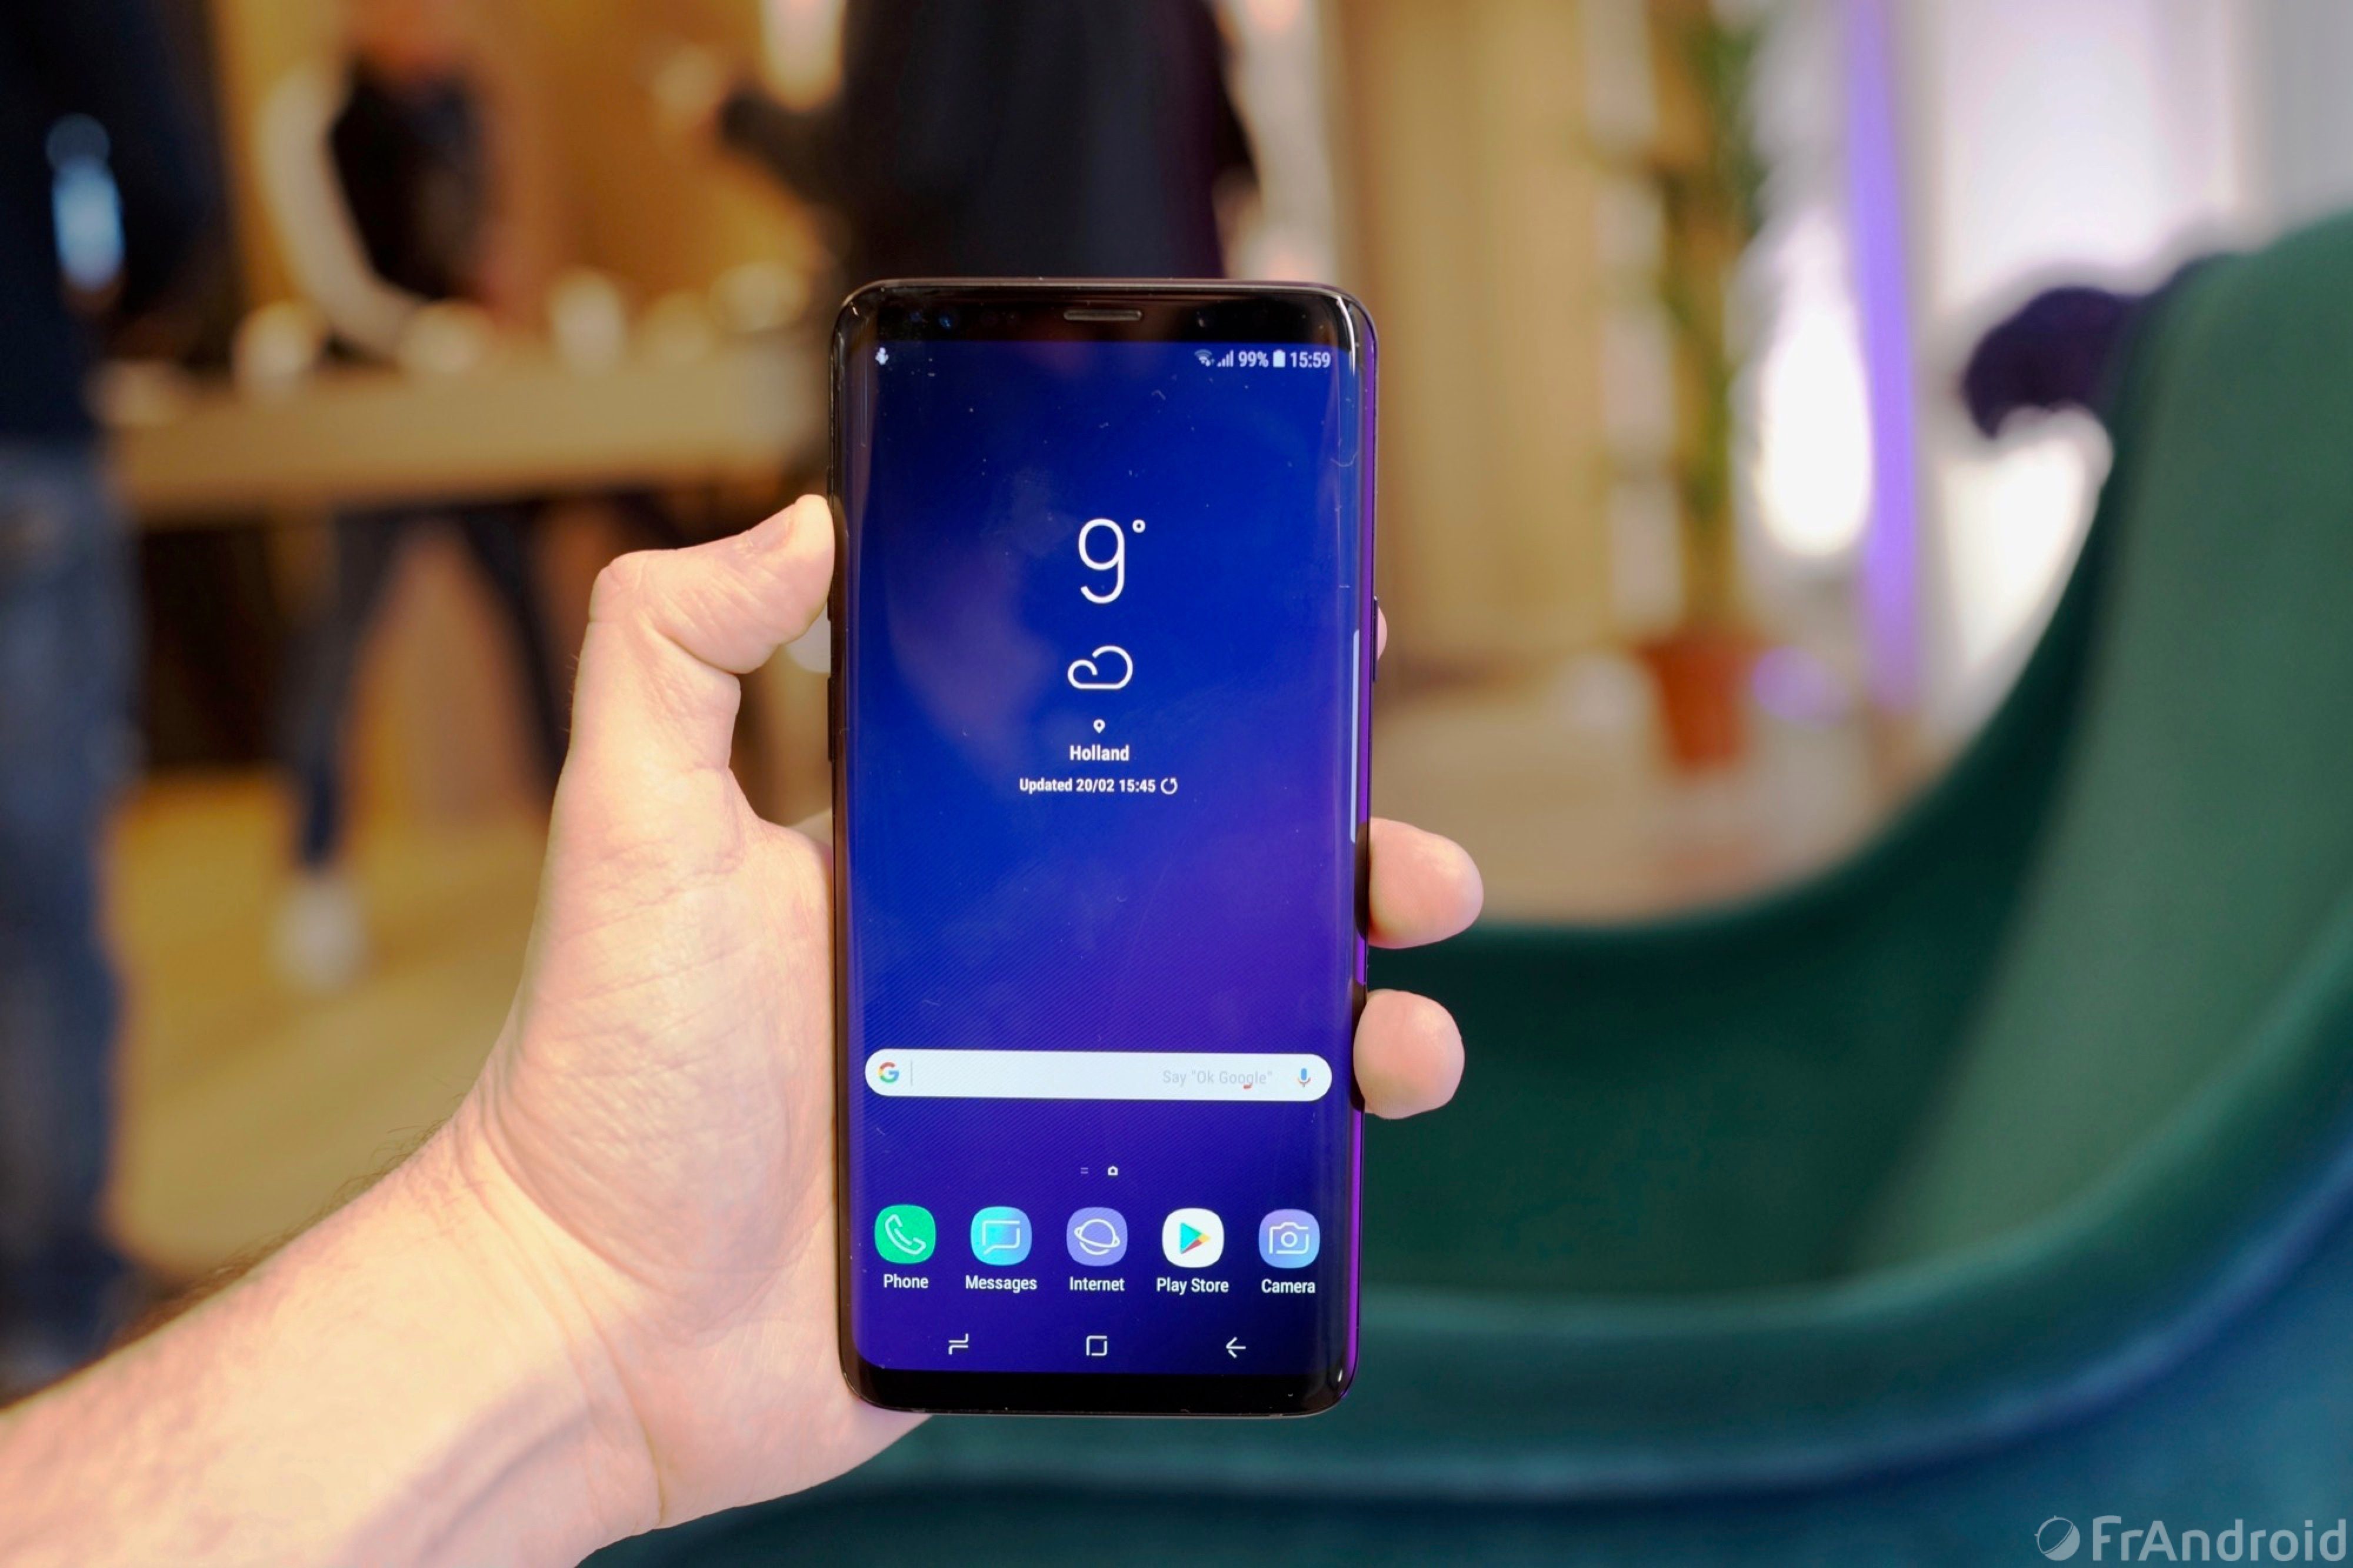 Prise en main du Samsung Galaxy S9 et du Galaxy S9+ - FrAndroid 5c6edf081f88